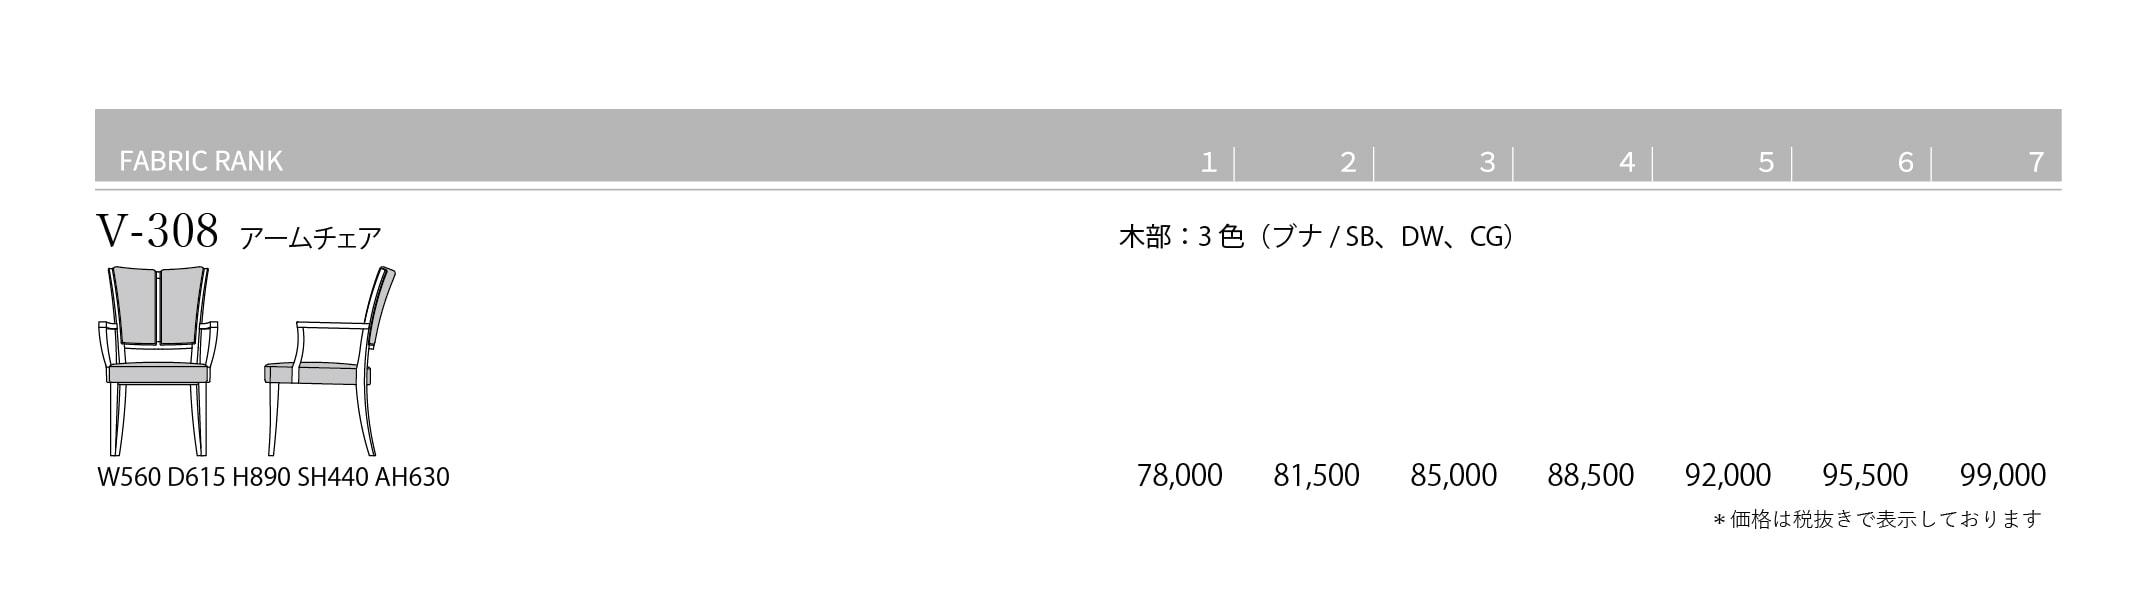 V-308 Price List